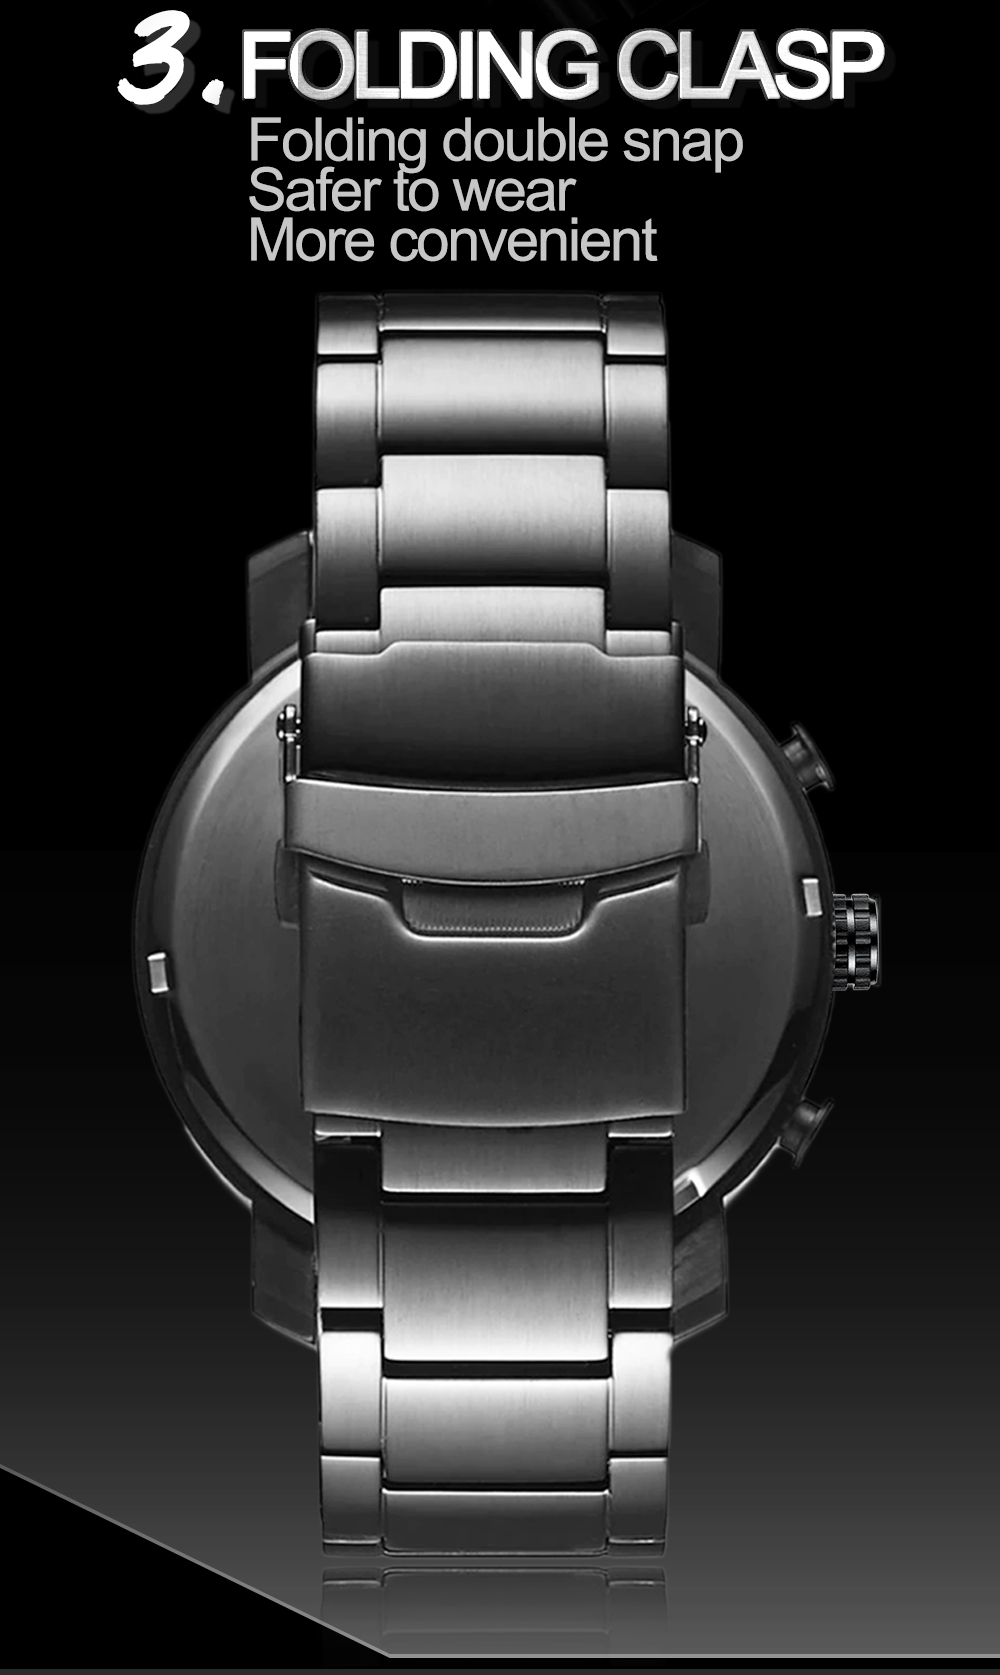 Hef179b45a4e5421480331ba7facb7d33U DropShipping Big Dial 45mm Full Black Stainless Steel Multi-function Calendar Men's Top Brand Luxury Watches Relogio Masculino